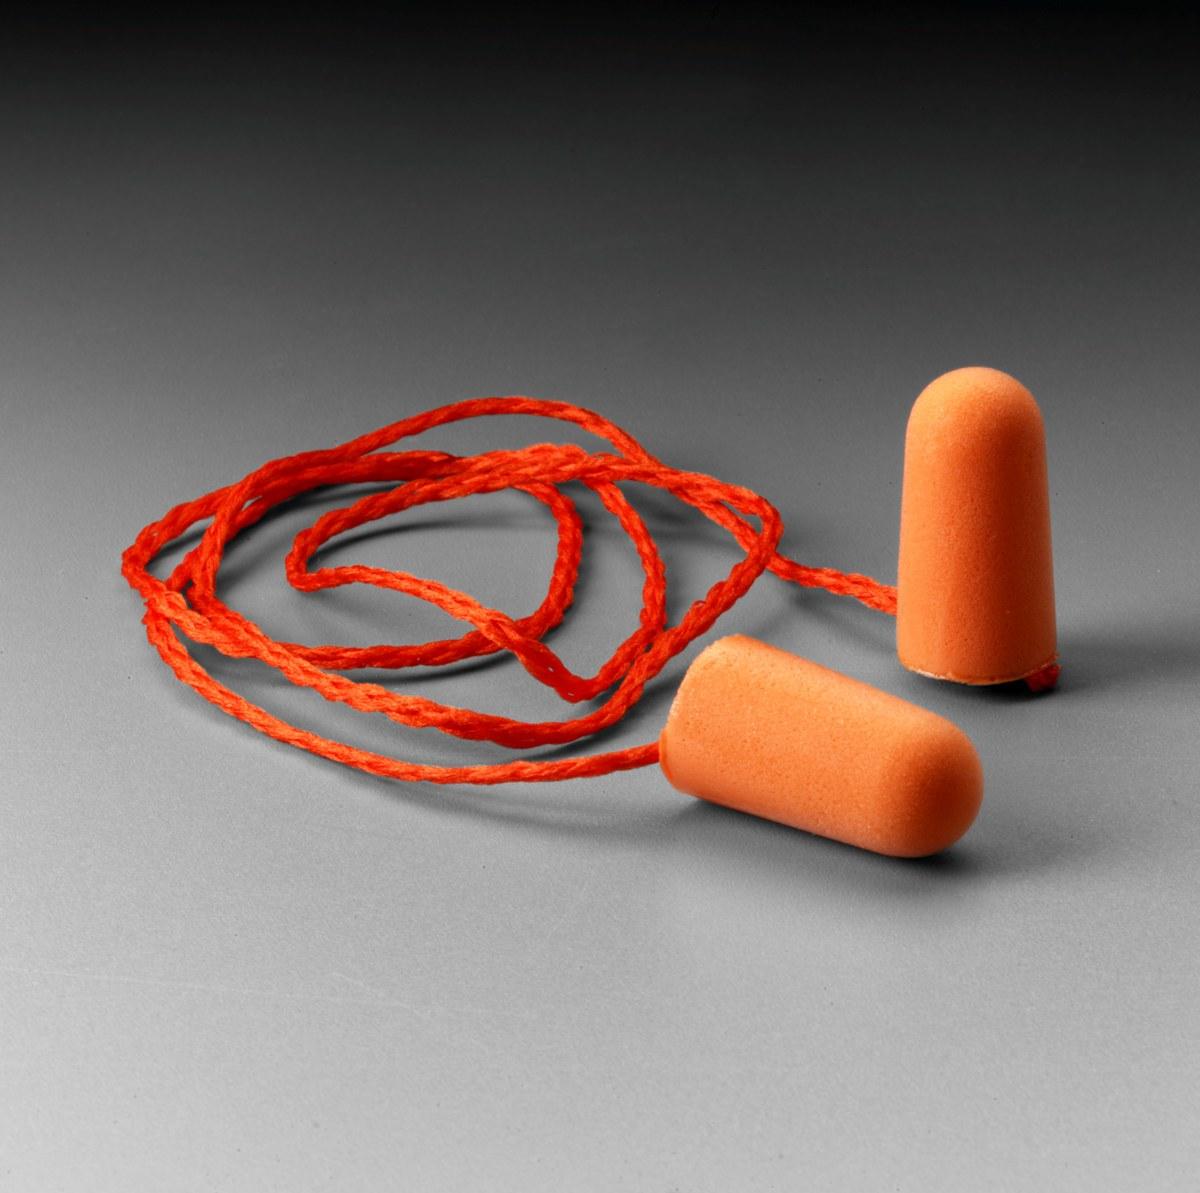 3M 1110 Ear Plugs 29009, Universal, Polyurethane Foam